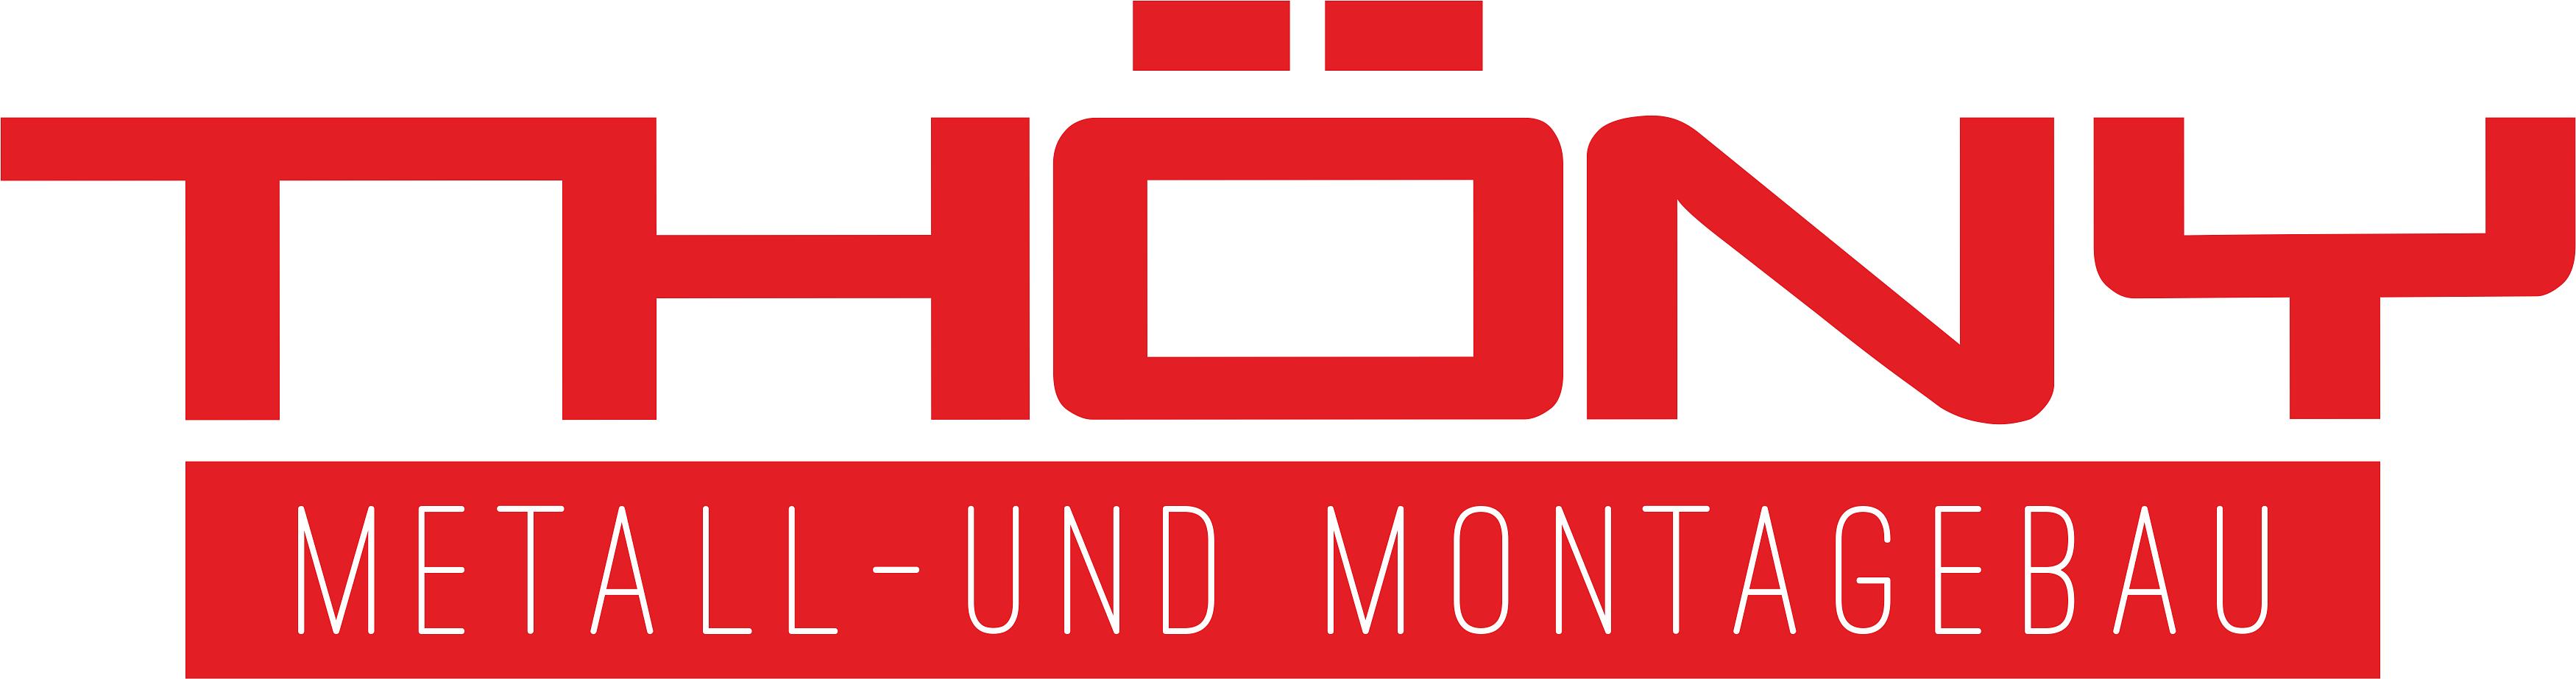 Thöny Metall- und Montagebau GmbH